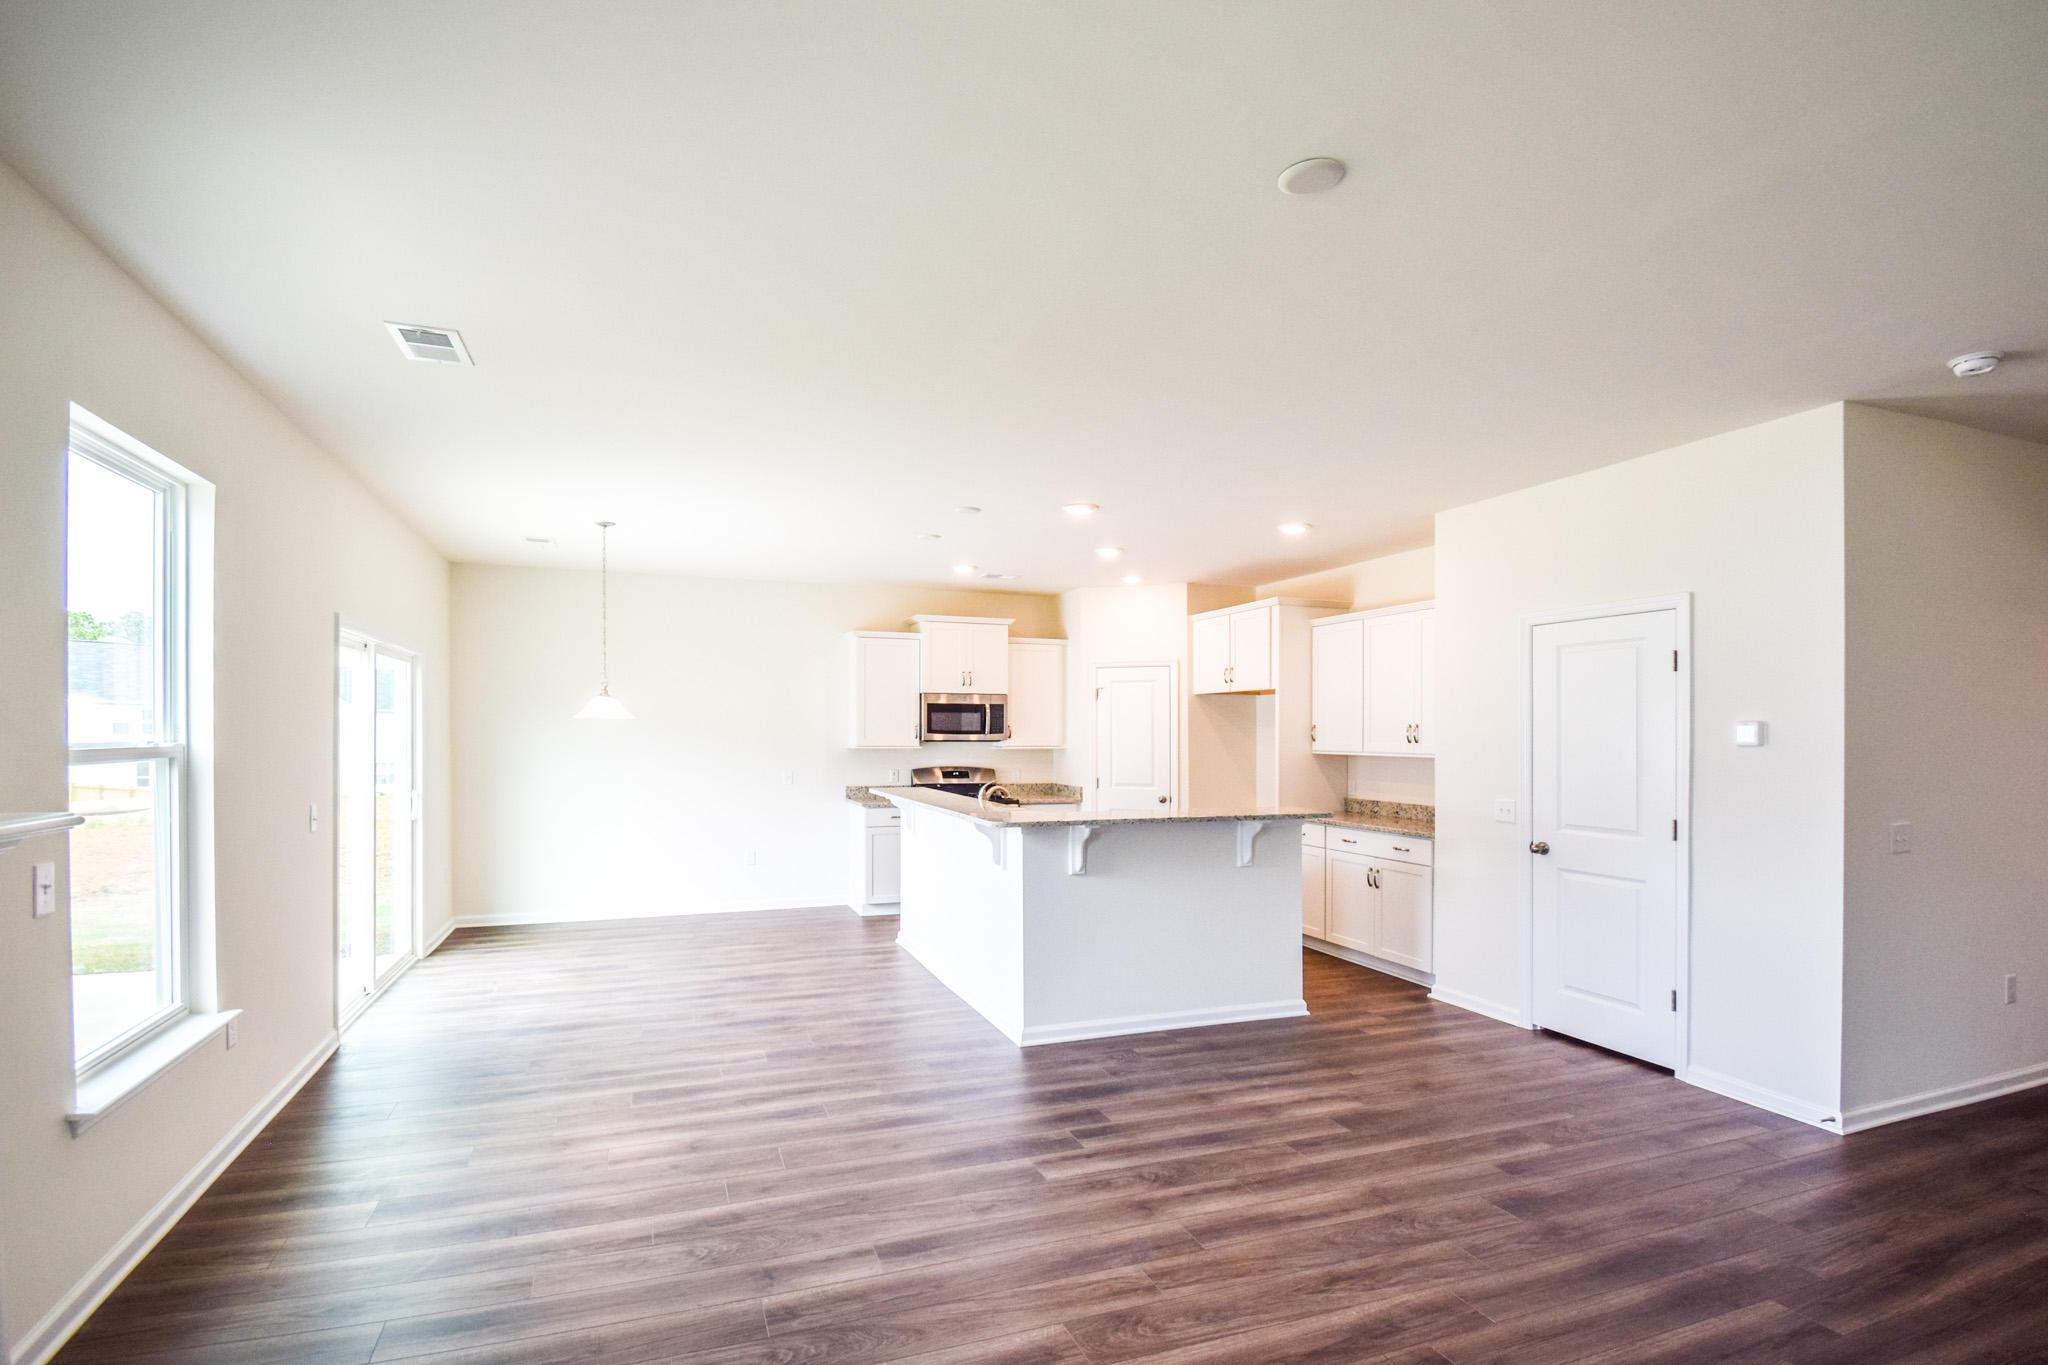 Cypress Grove Homes For Sale - 510 Lateleaf, Moncks Corner, SC - 13